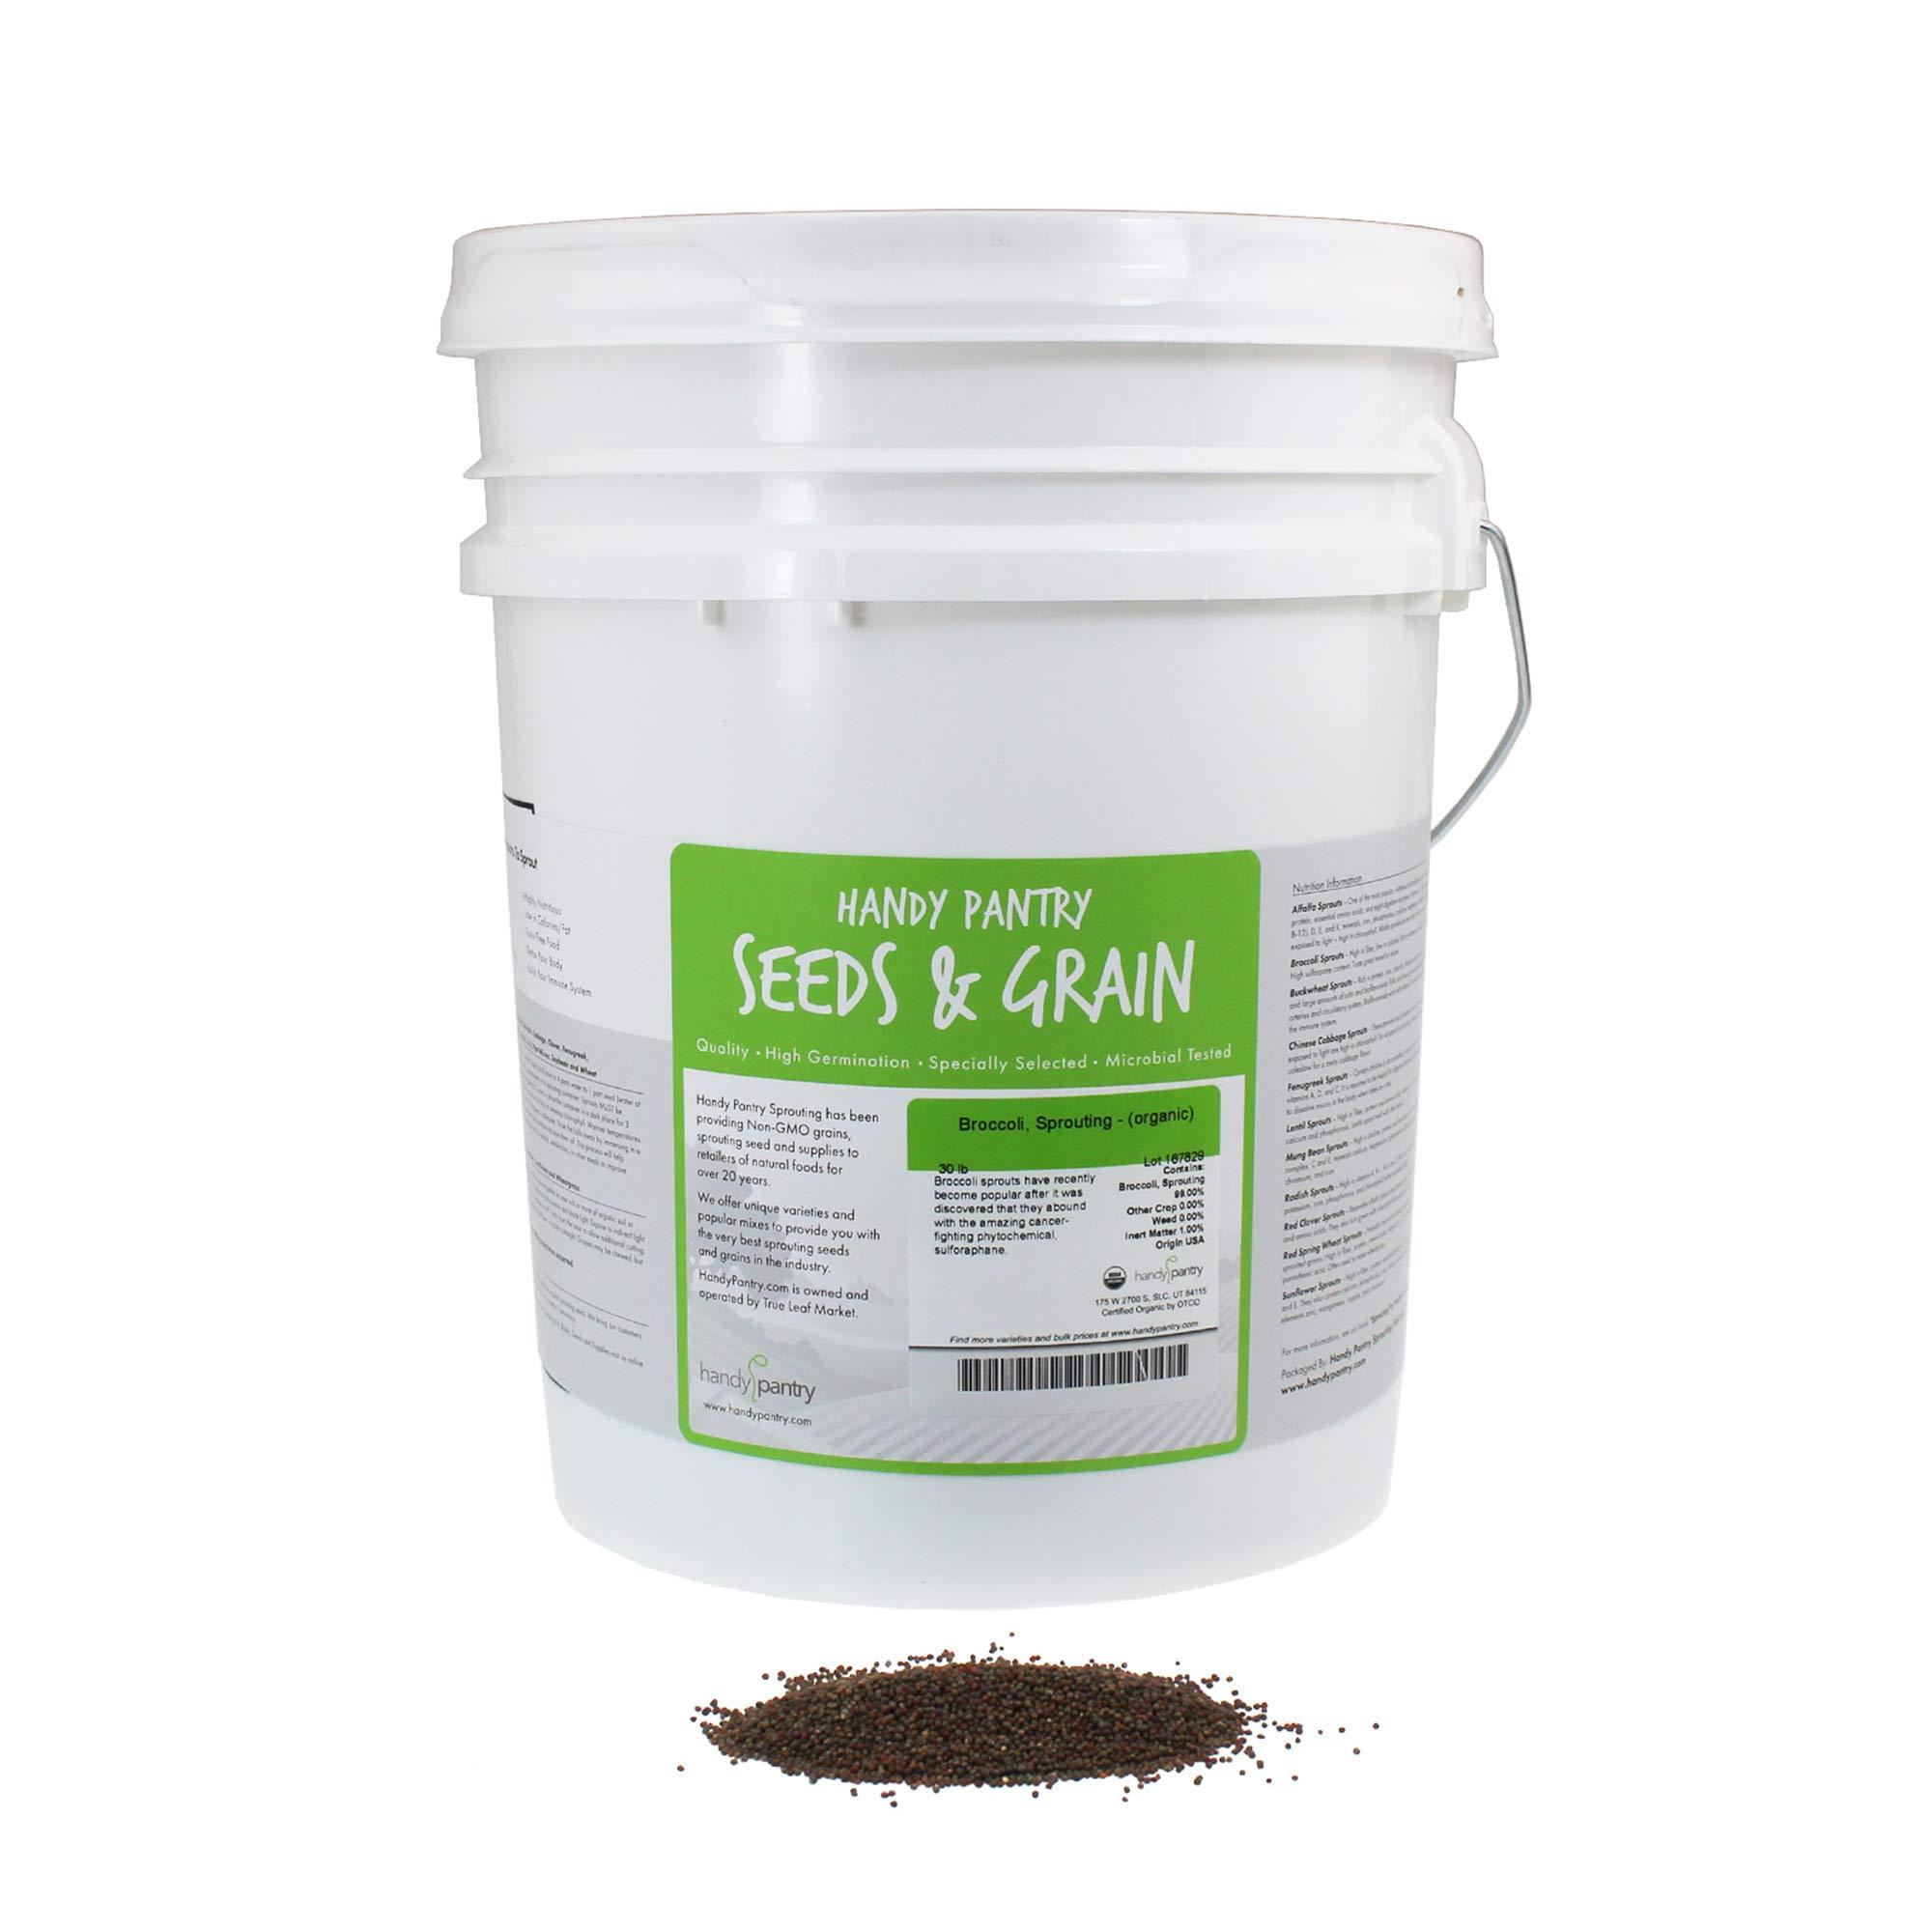 Organic Broccoli Sprouting Seeds by Handy Pantry   30 Pound Reusable Bucket   Bulk Non-GMO Broccoli Sprouts Seeds, Contain Sulforaphane